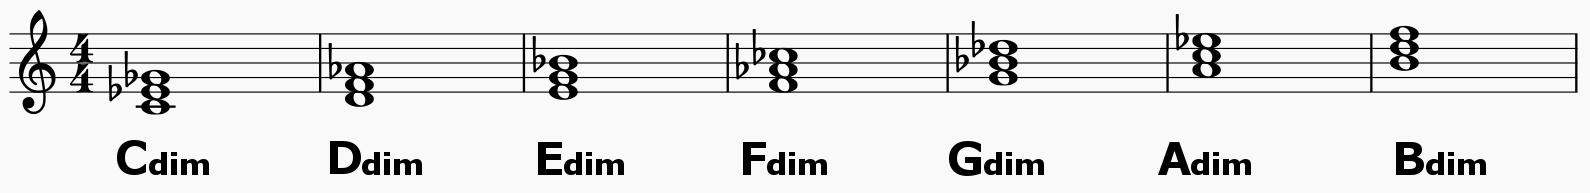 chordname_dim